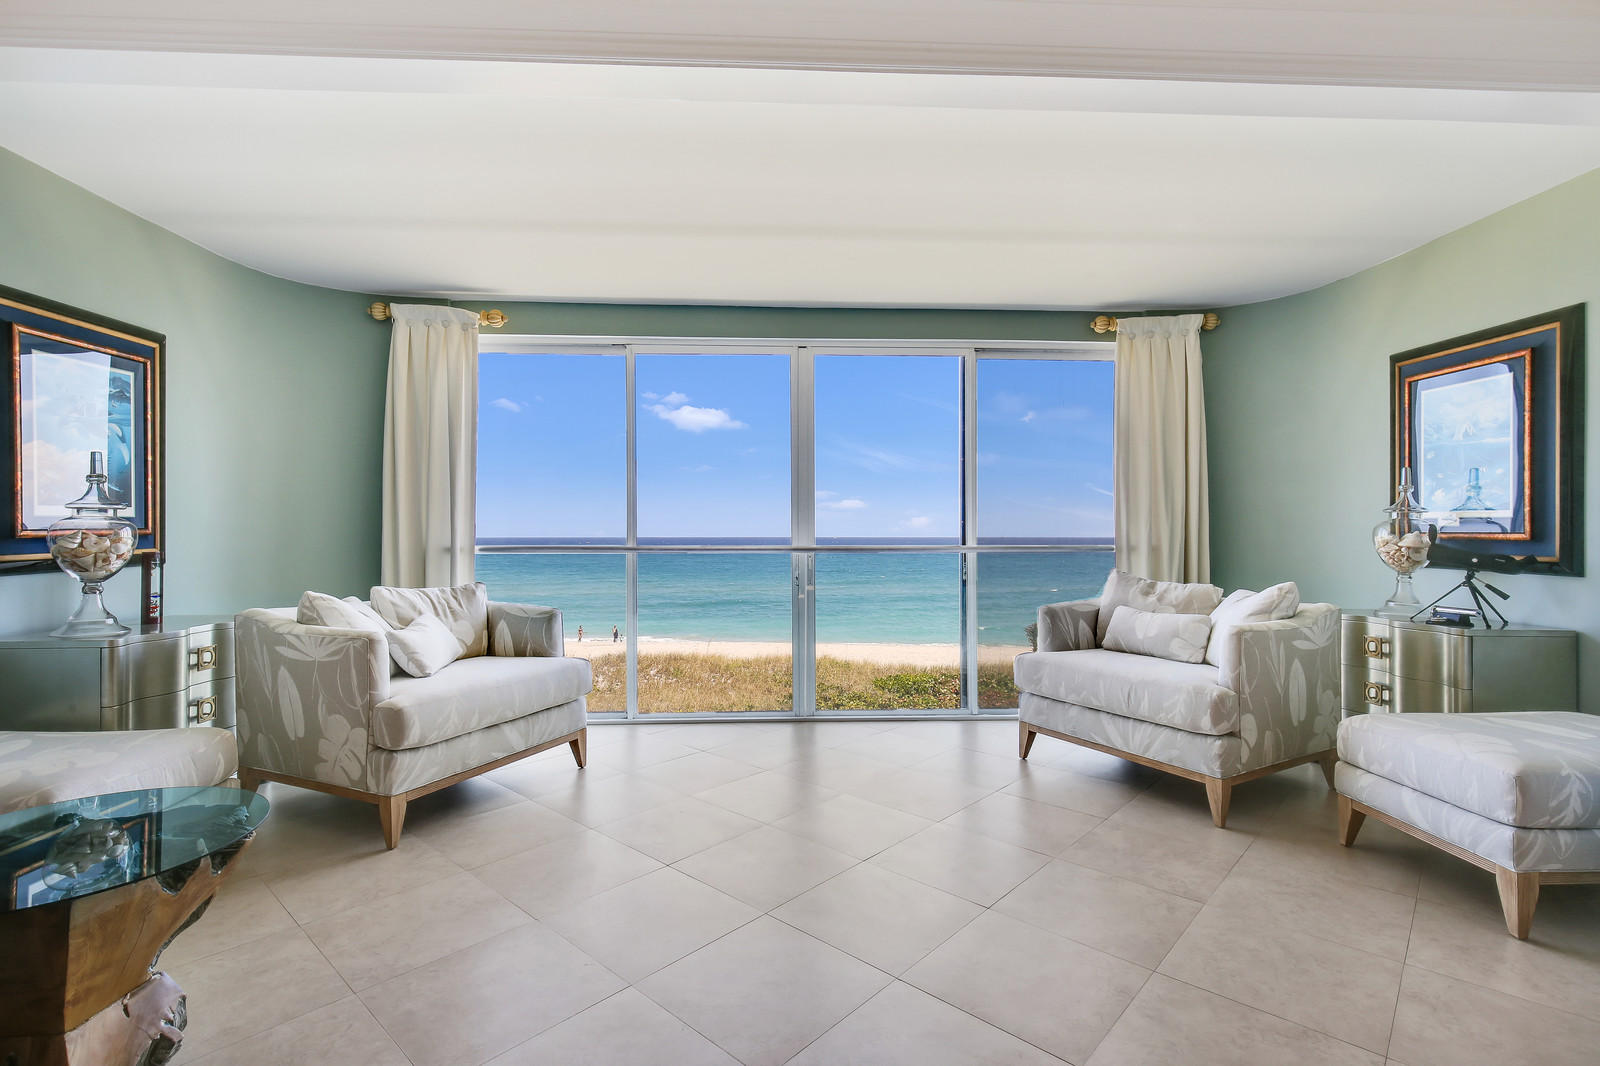 2155 S Ocean Boulevard, #Ph C, Delray Beach, FL 33483